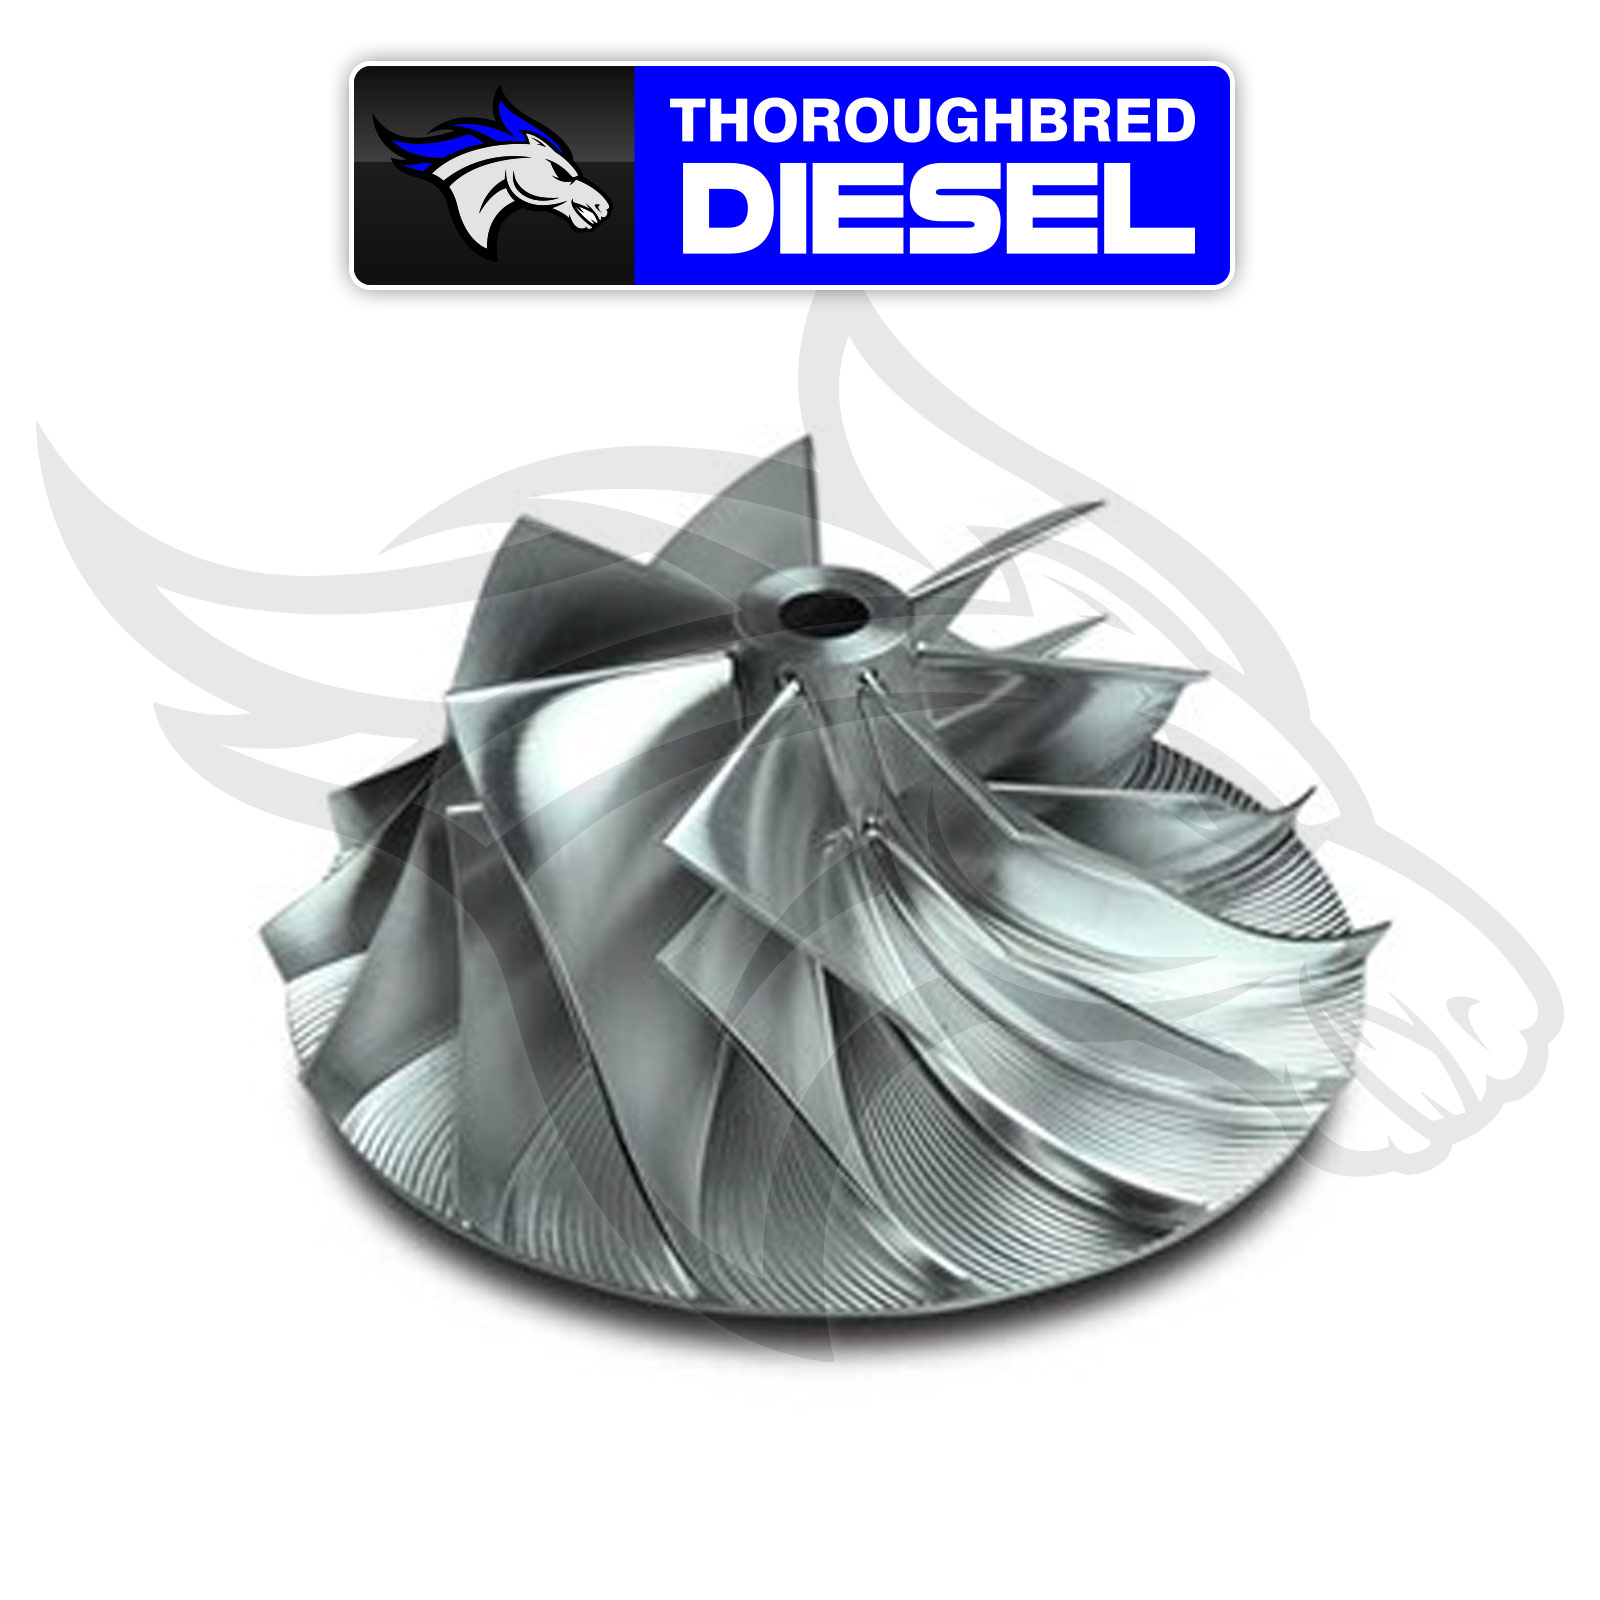 DieselSite Billet Turbo Compressor Wicked Wheel 2 for 98.5-02 Dodge Cummins 5.9L